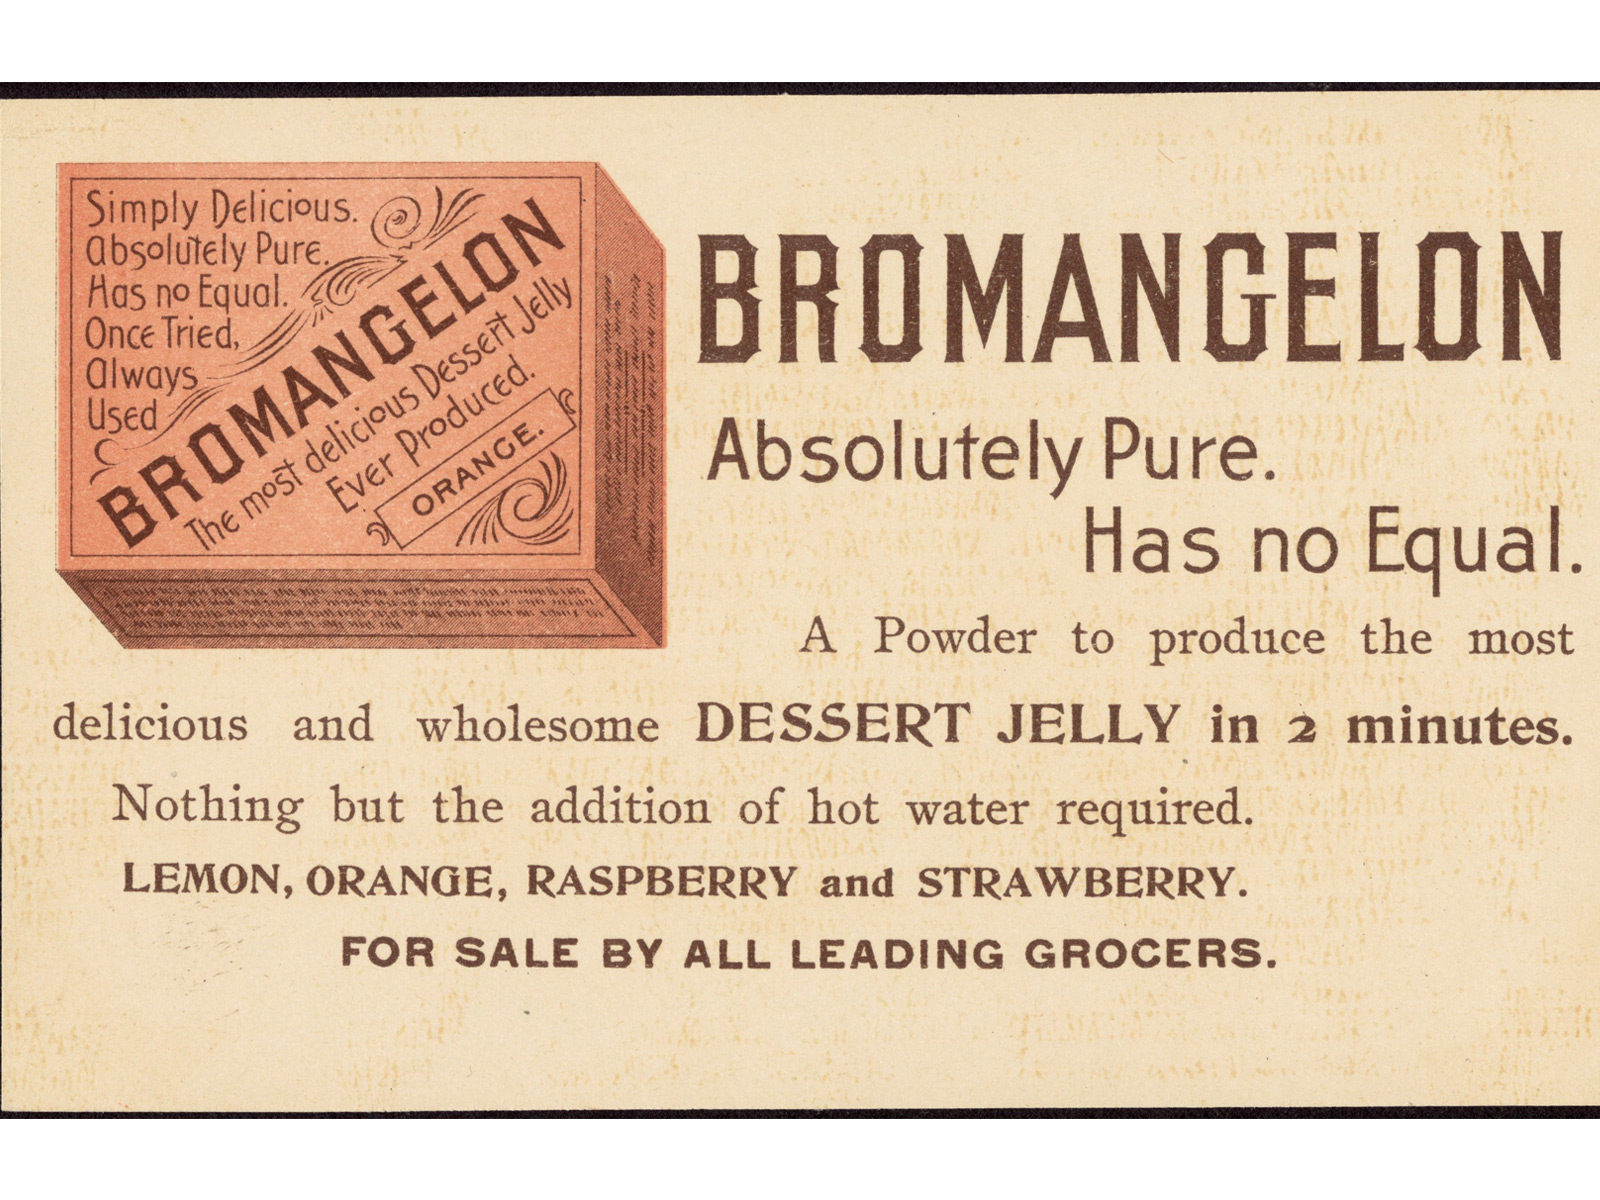 bromangelon-ad-2.jpg